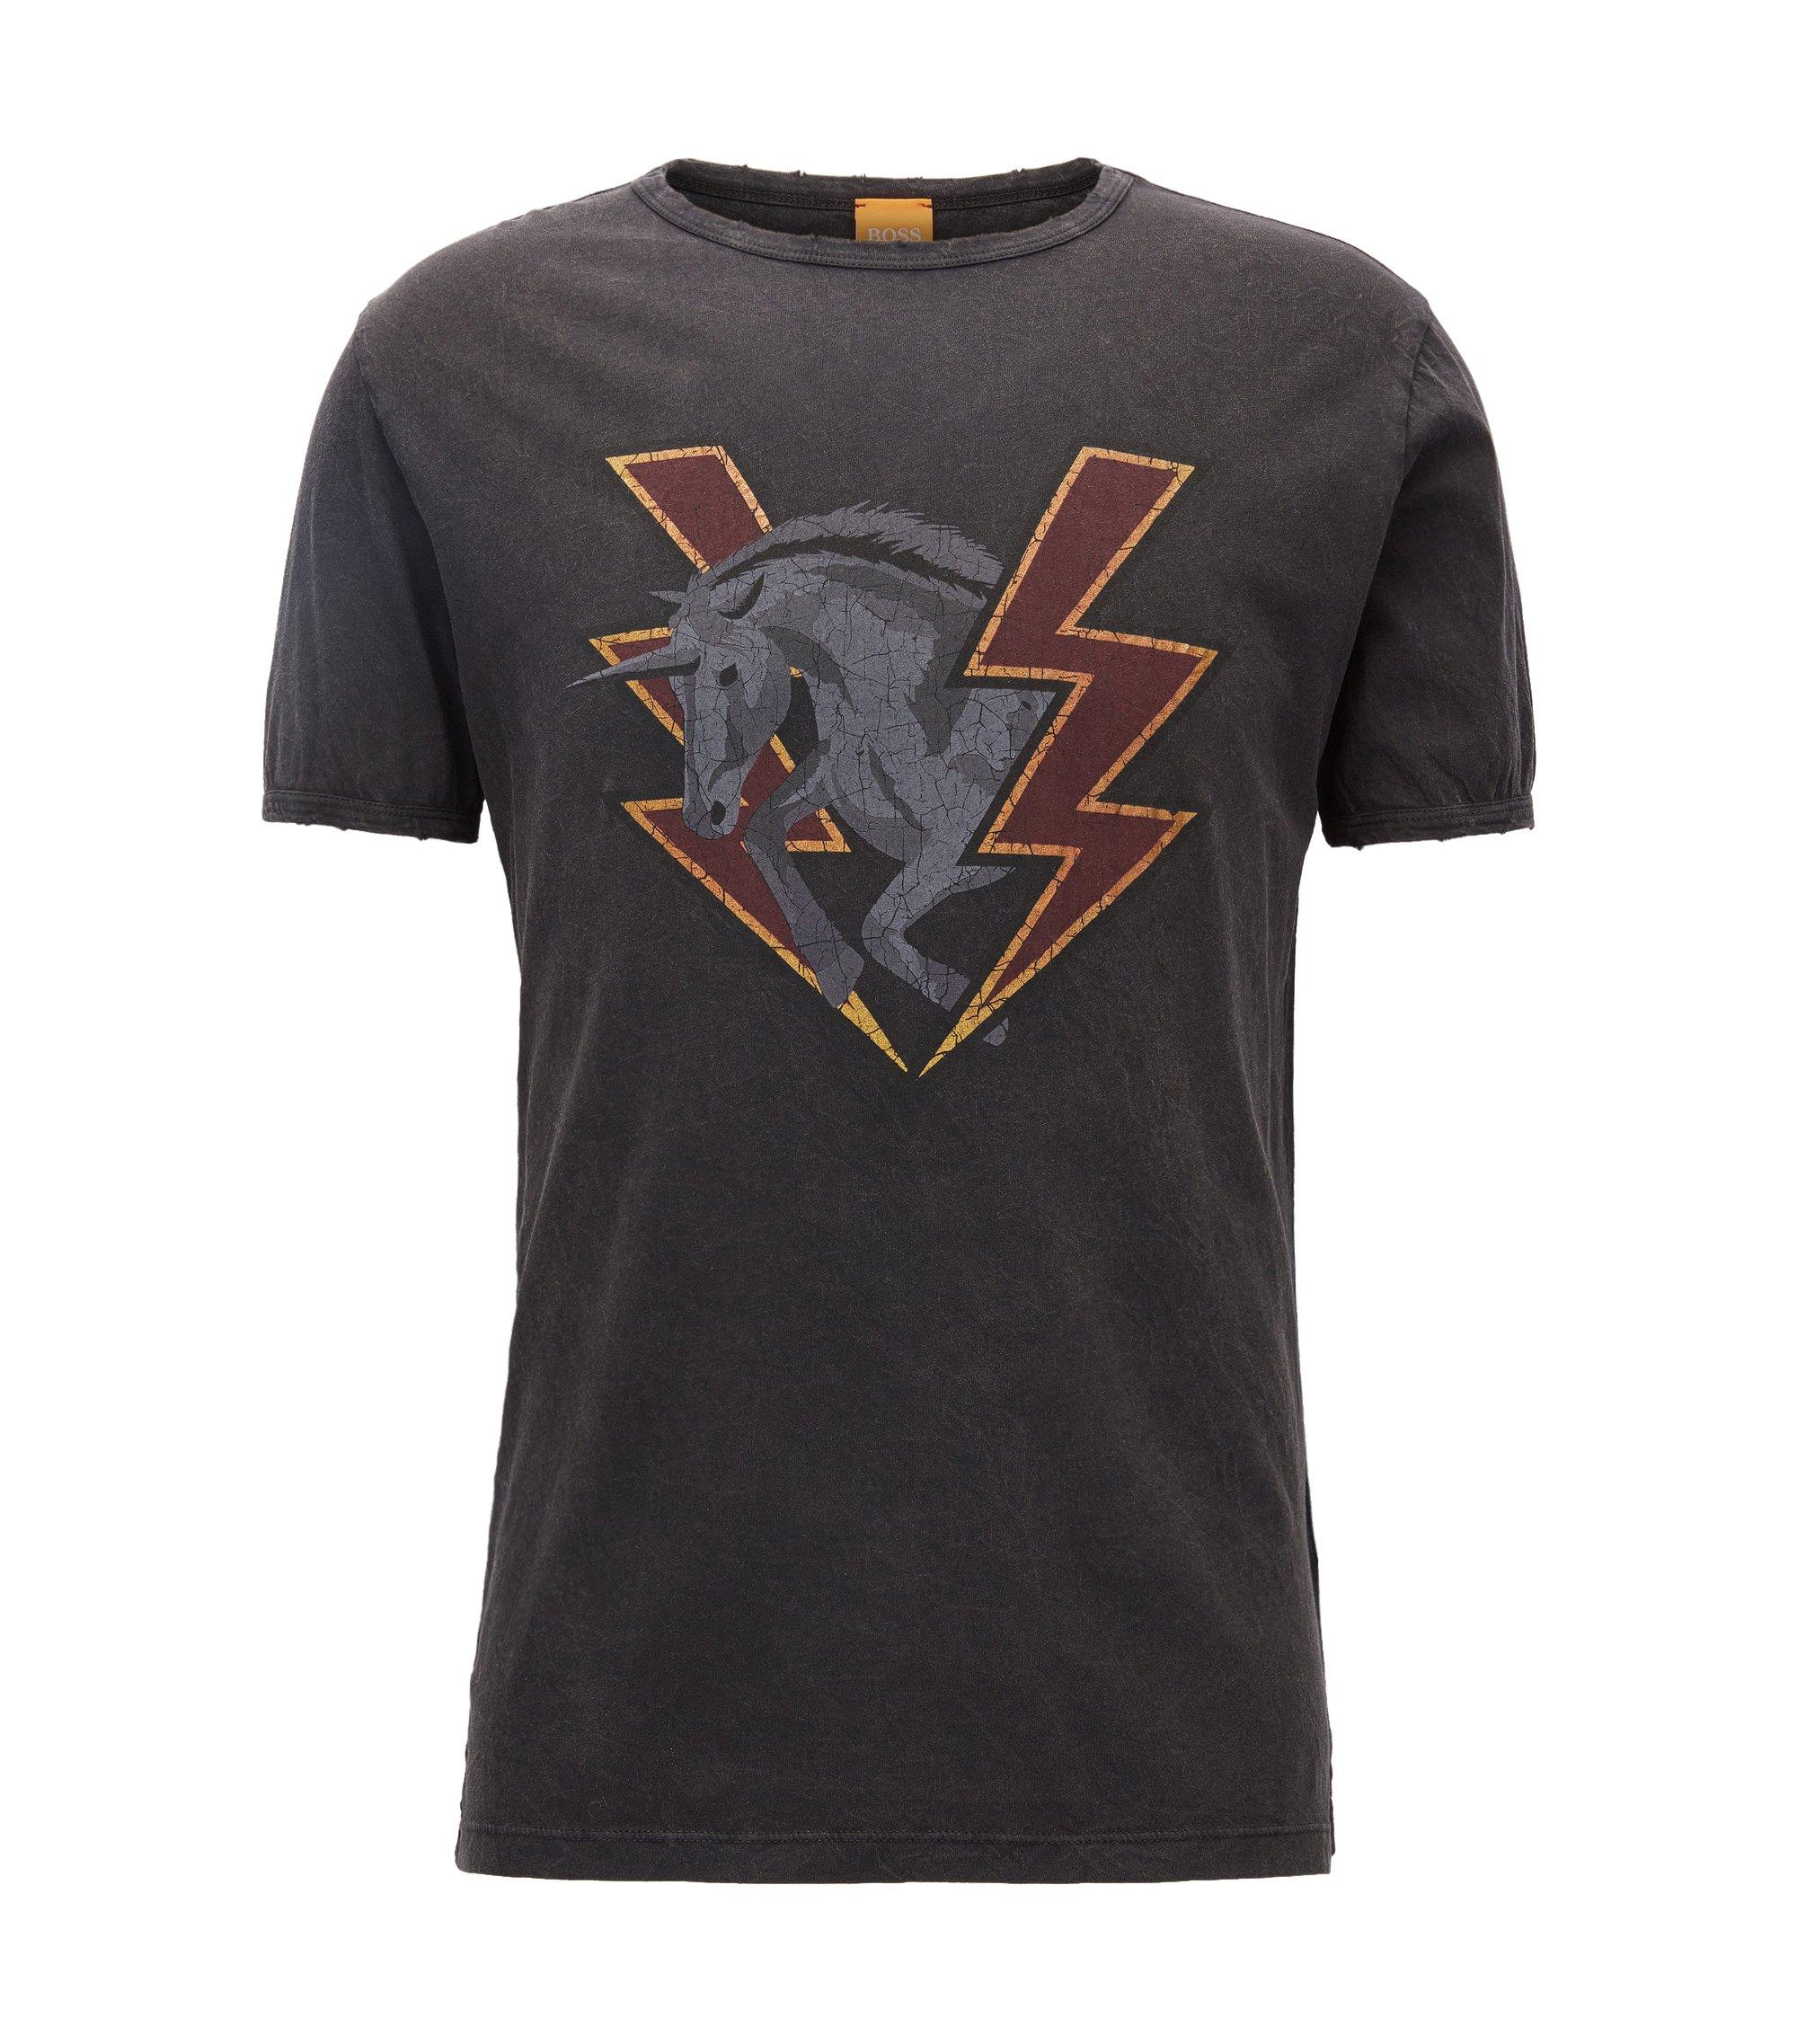 Cotton Graphic T-Shirt | Taboo, Black